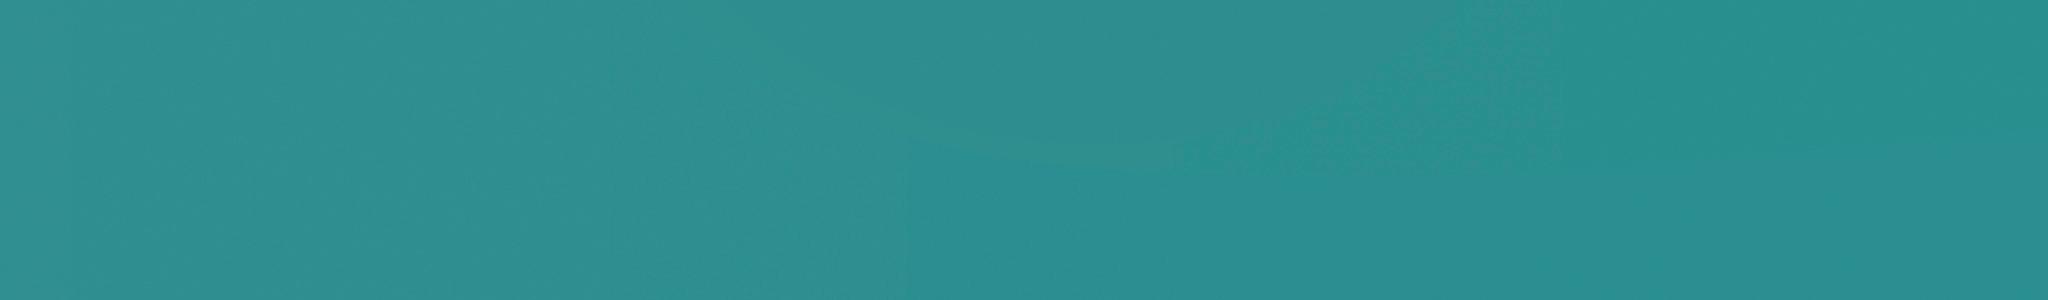 HU 16245 ABS hrana zelená hladká 100 lesk 10°